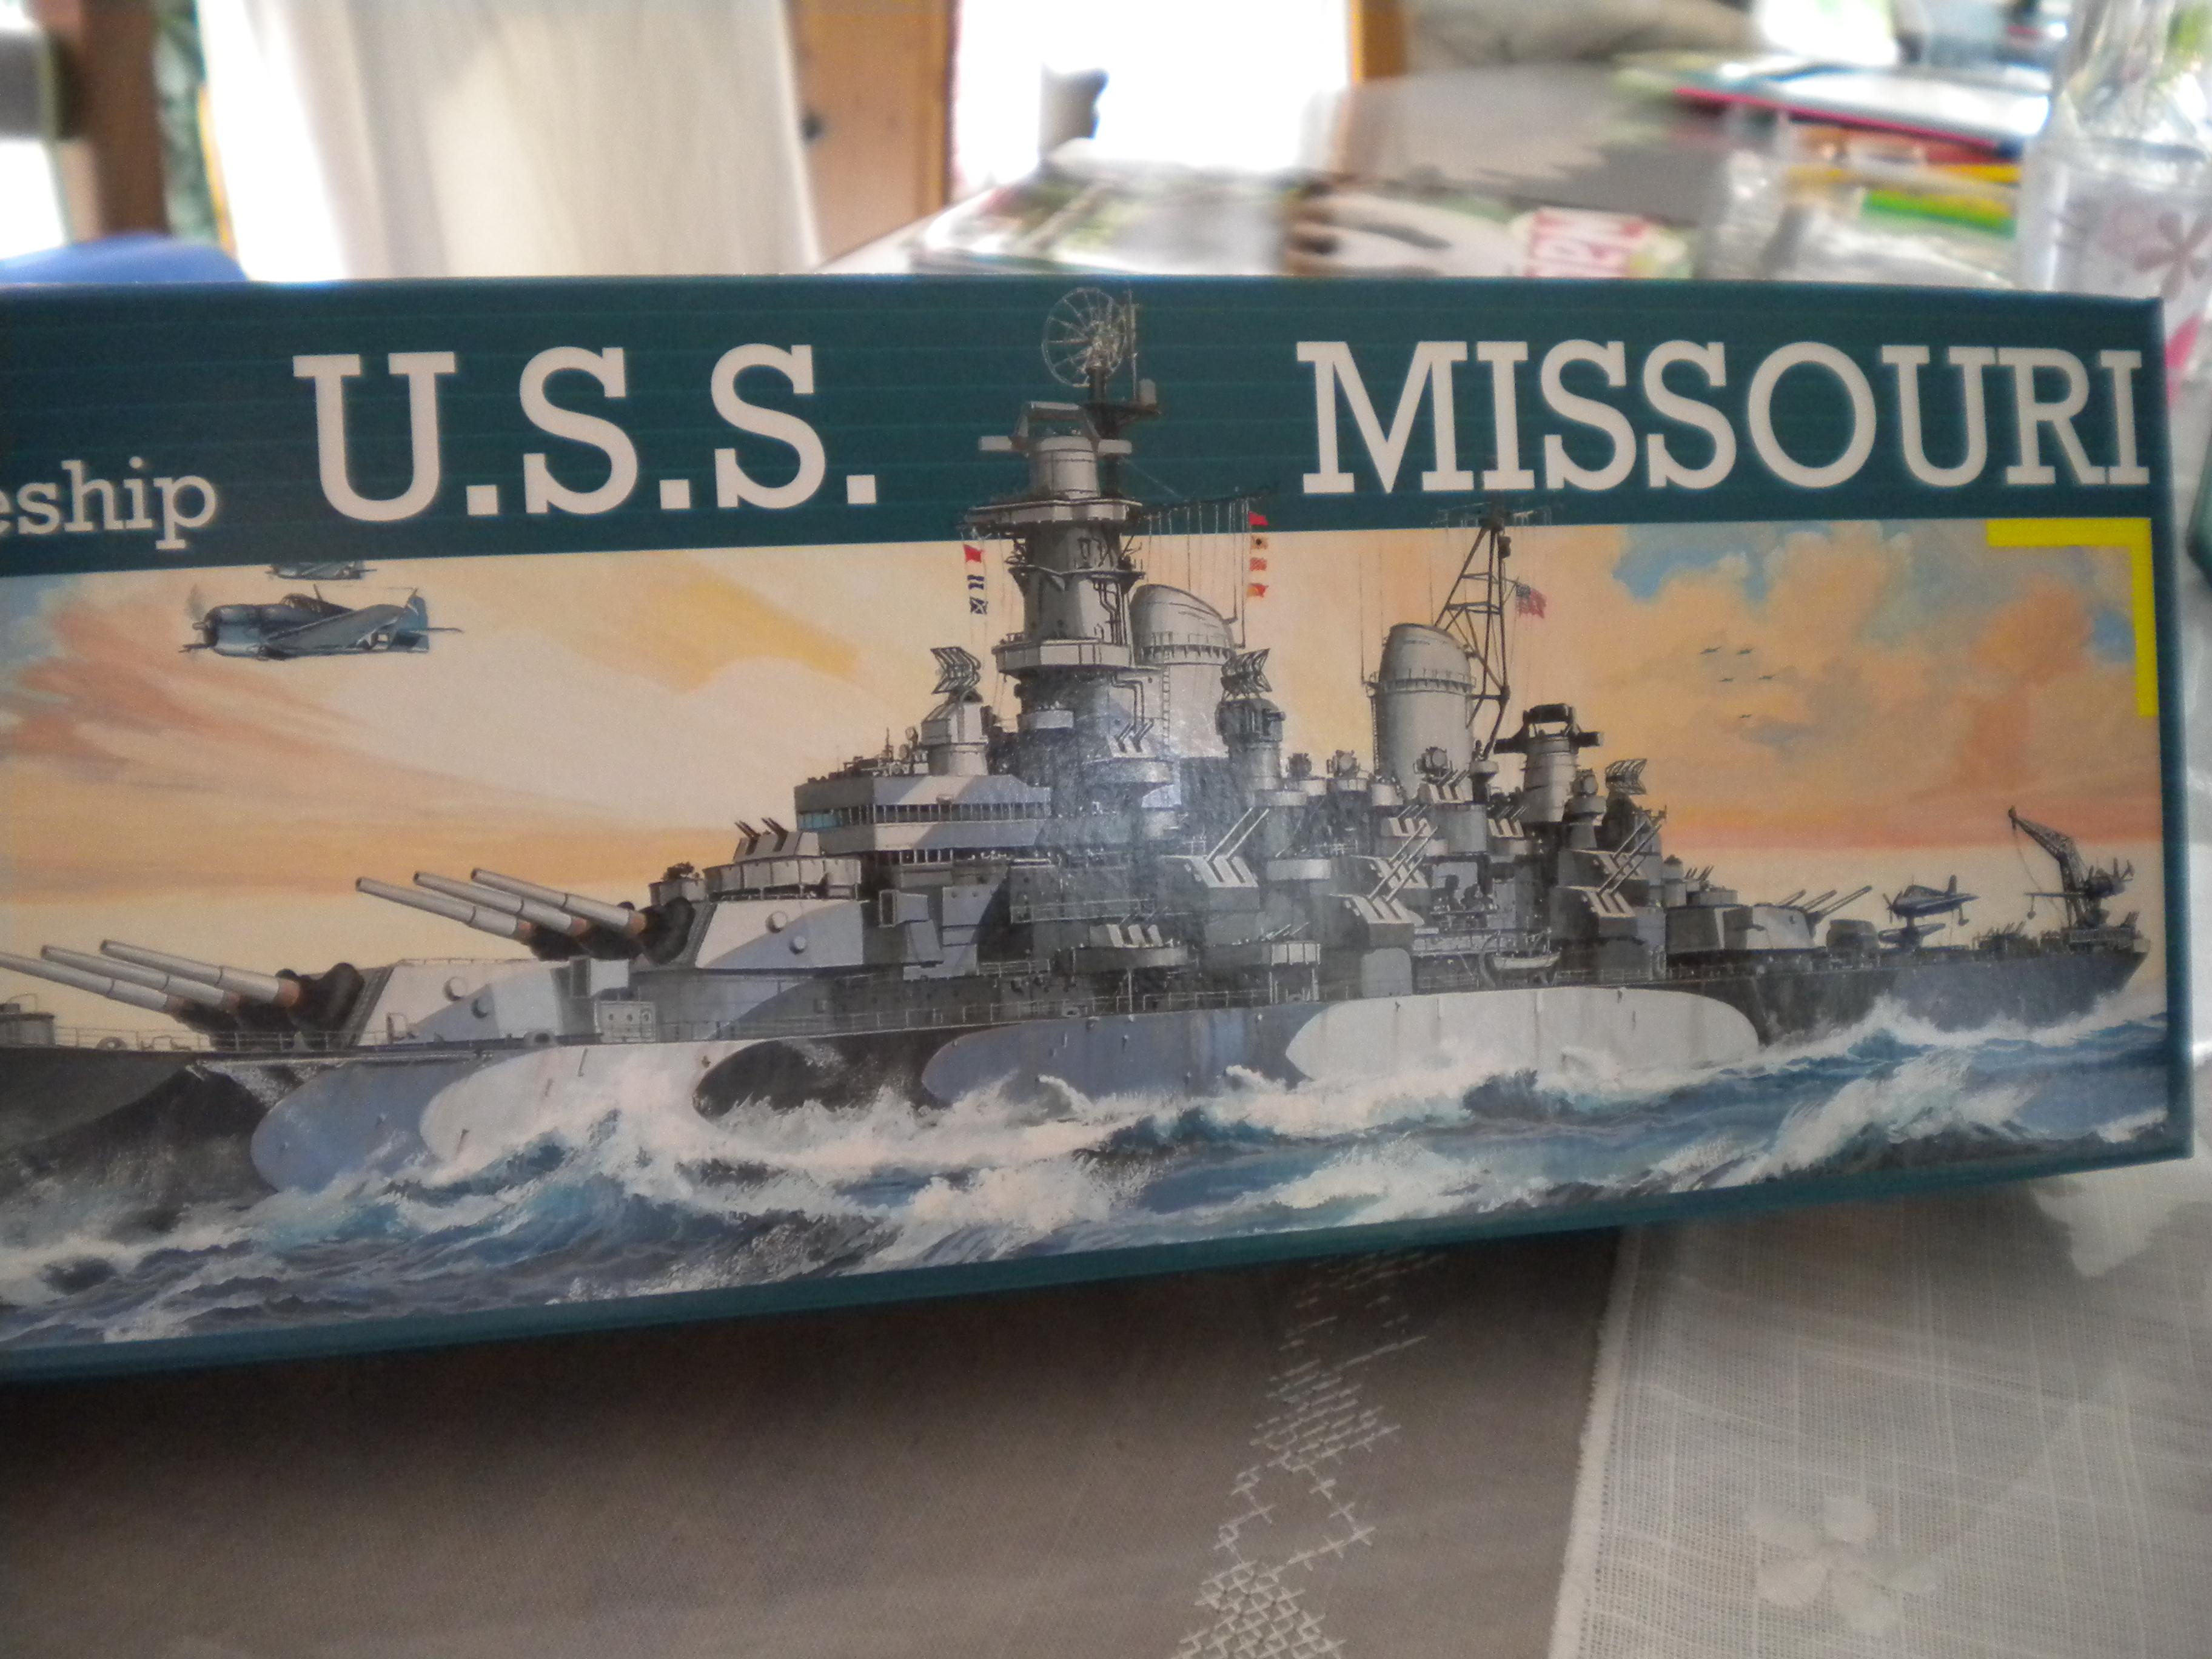 U.S.S MISSOURI 971102DSCN6439